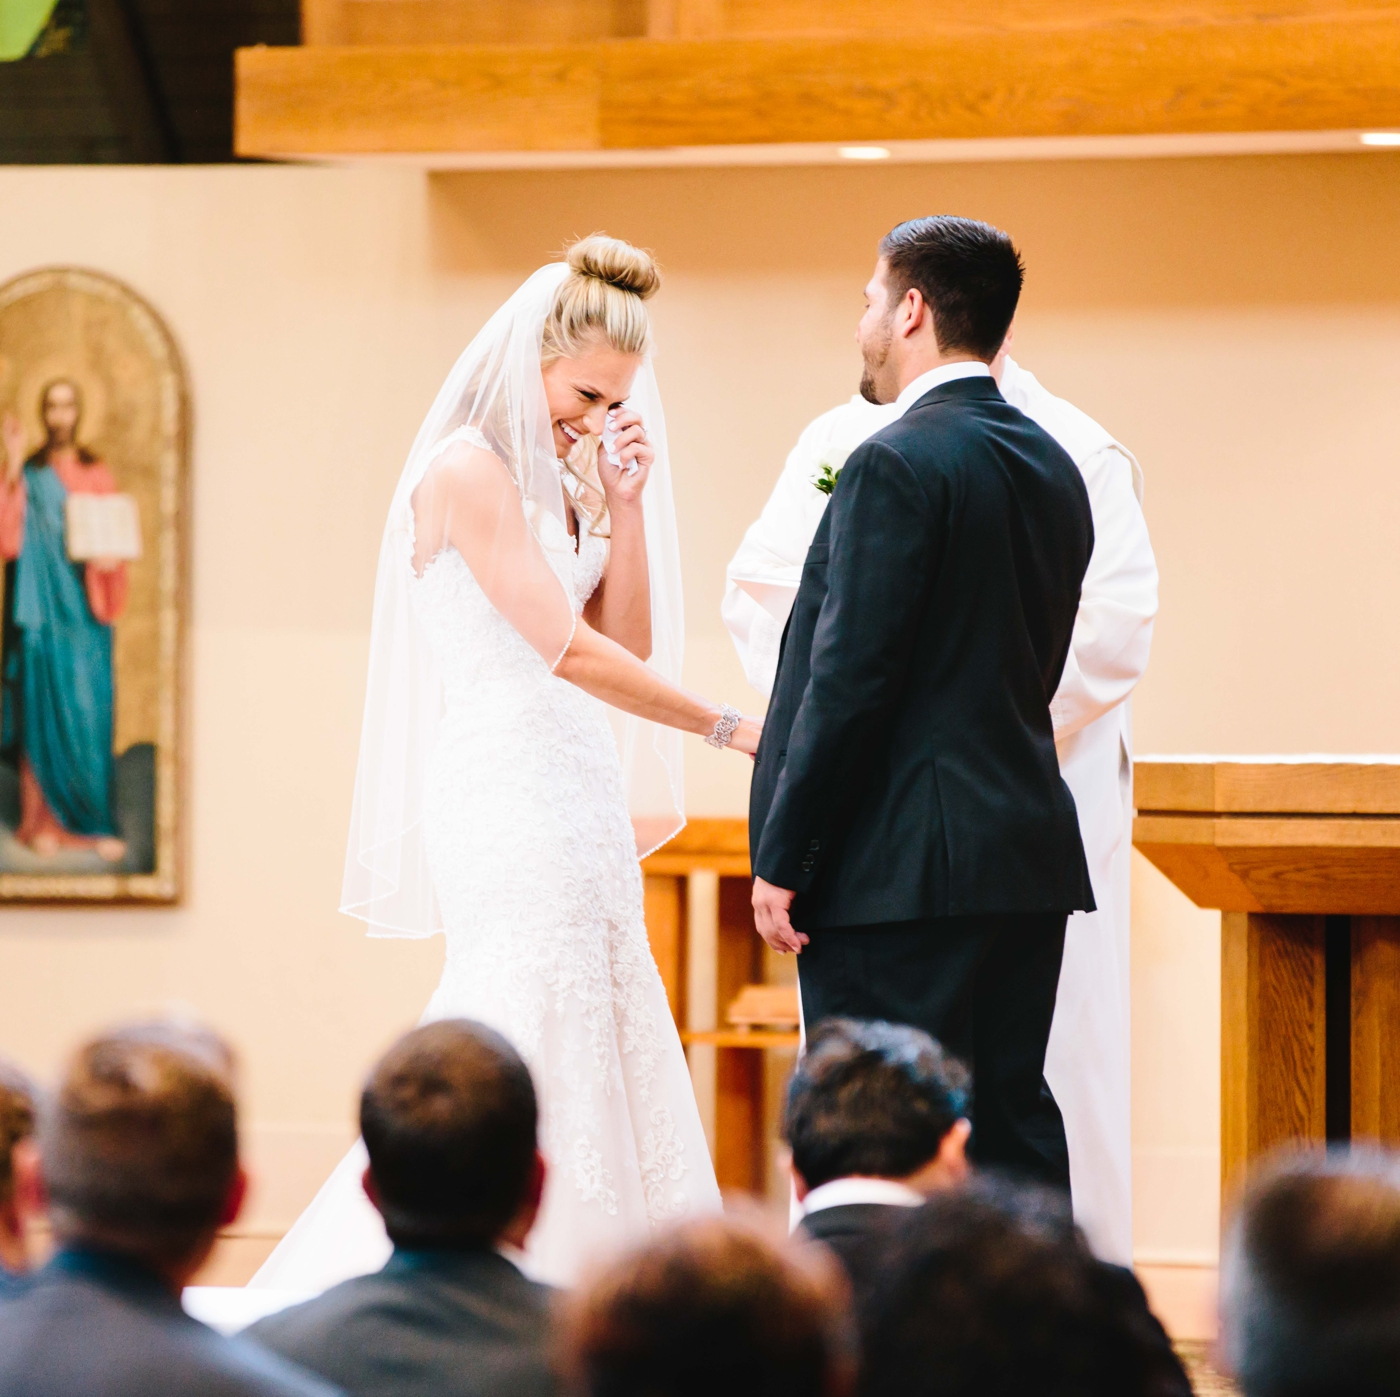 chicago-fine-art-wedding-photography-patano21